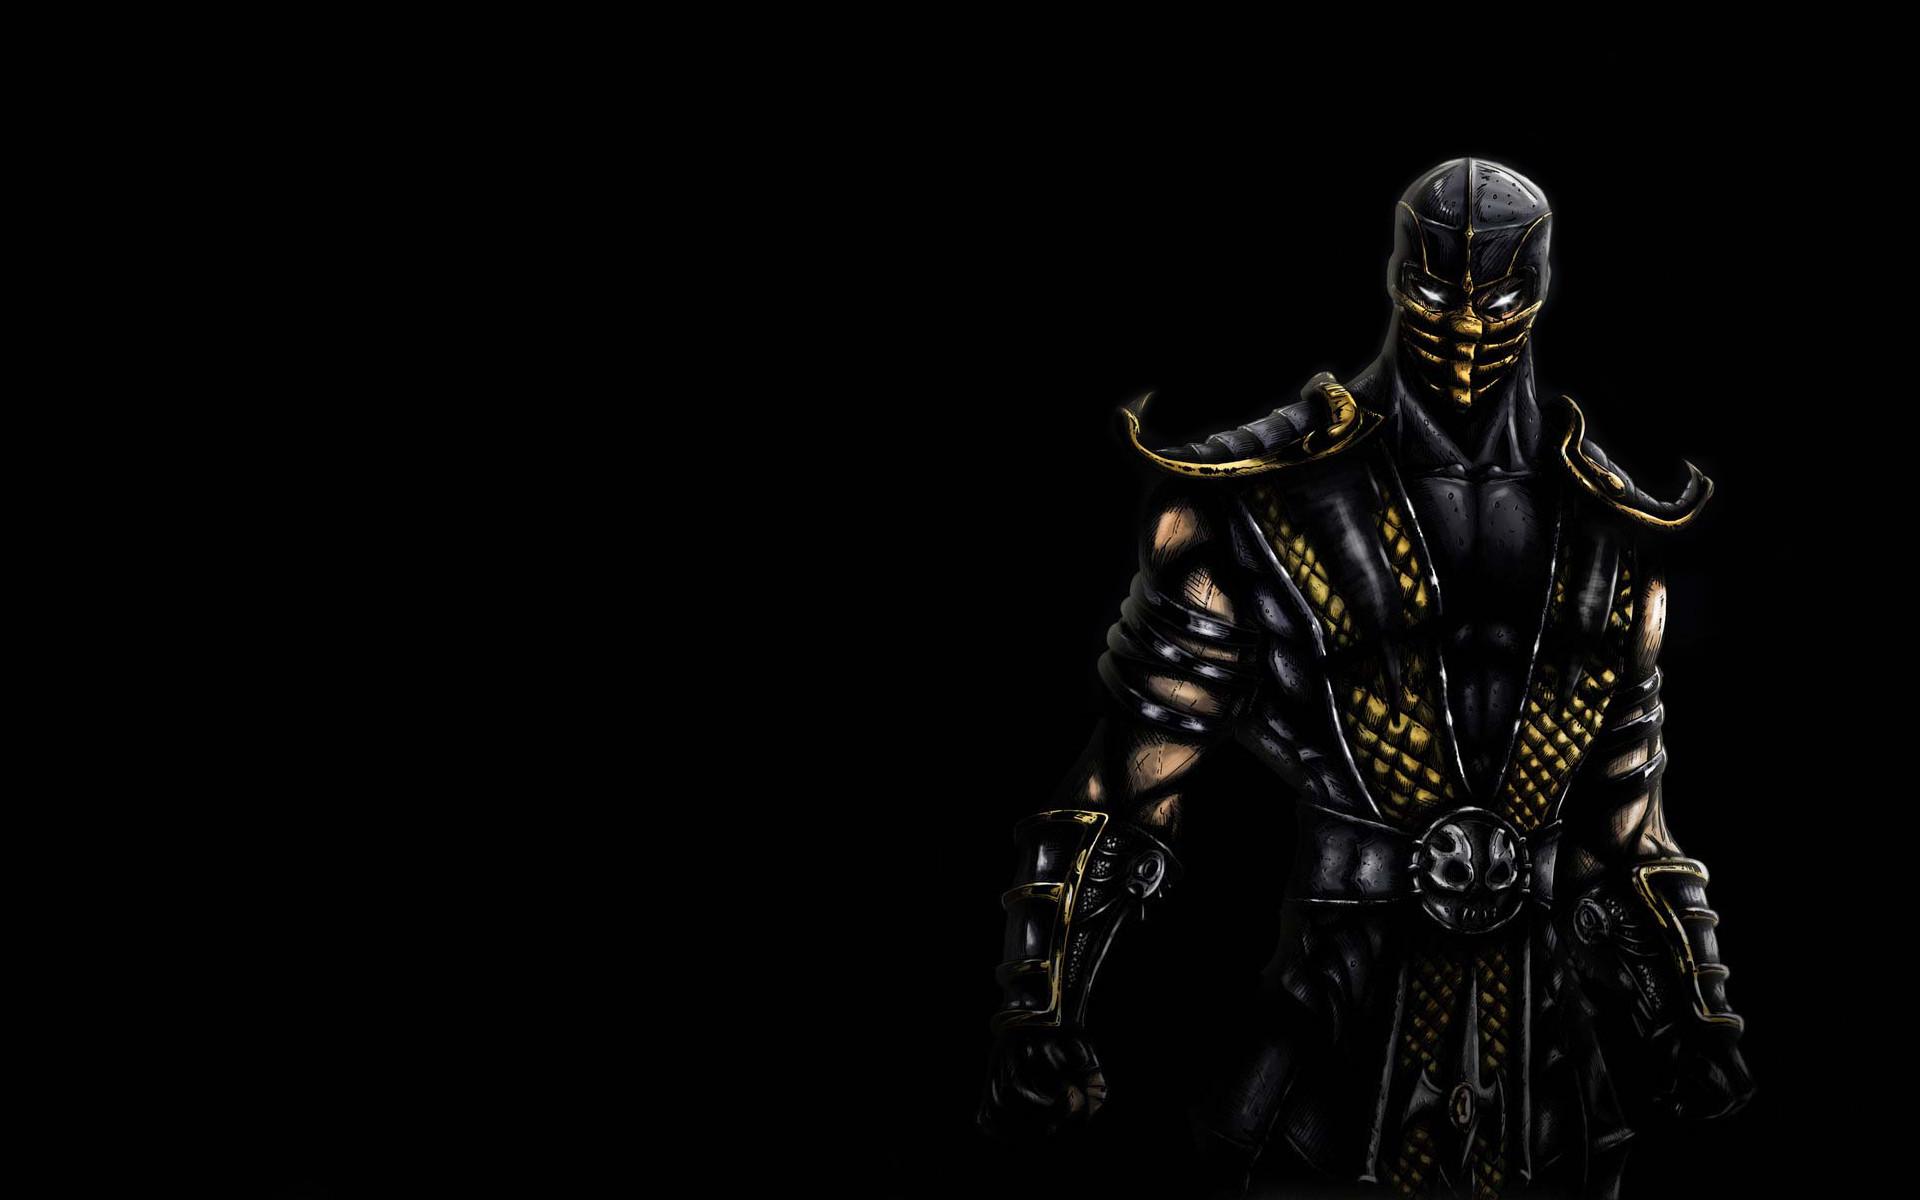 Mortal Kombat wallpaper Scorpion 3